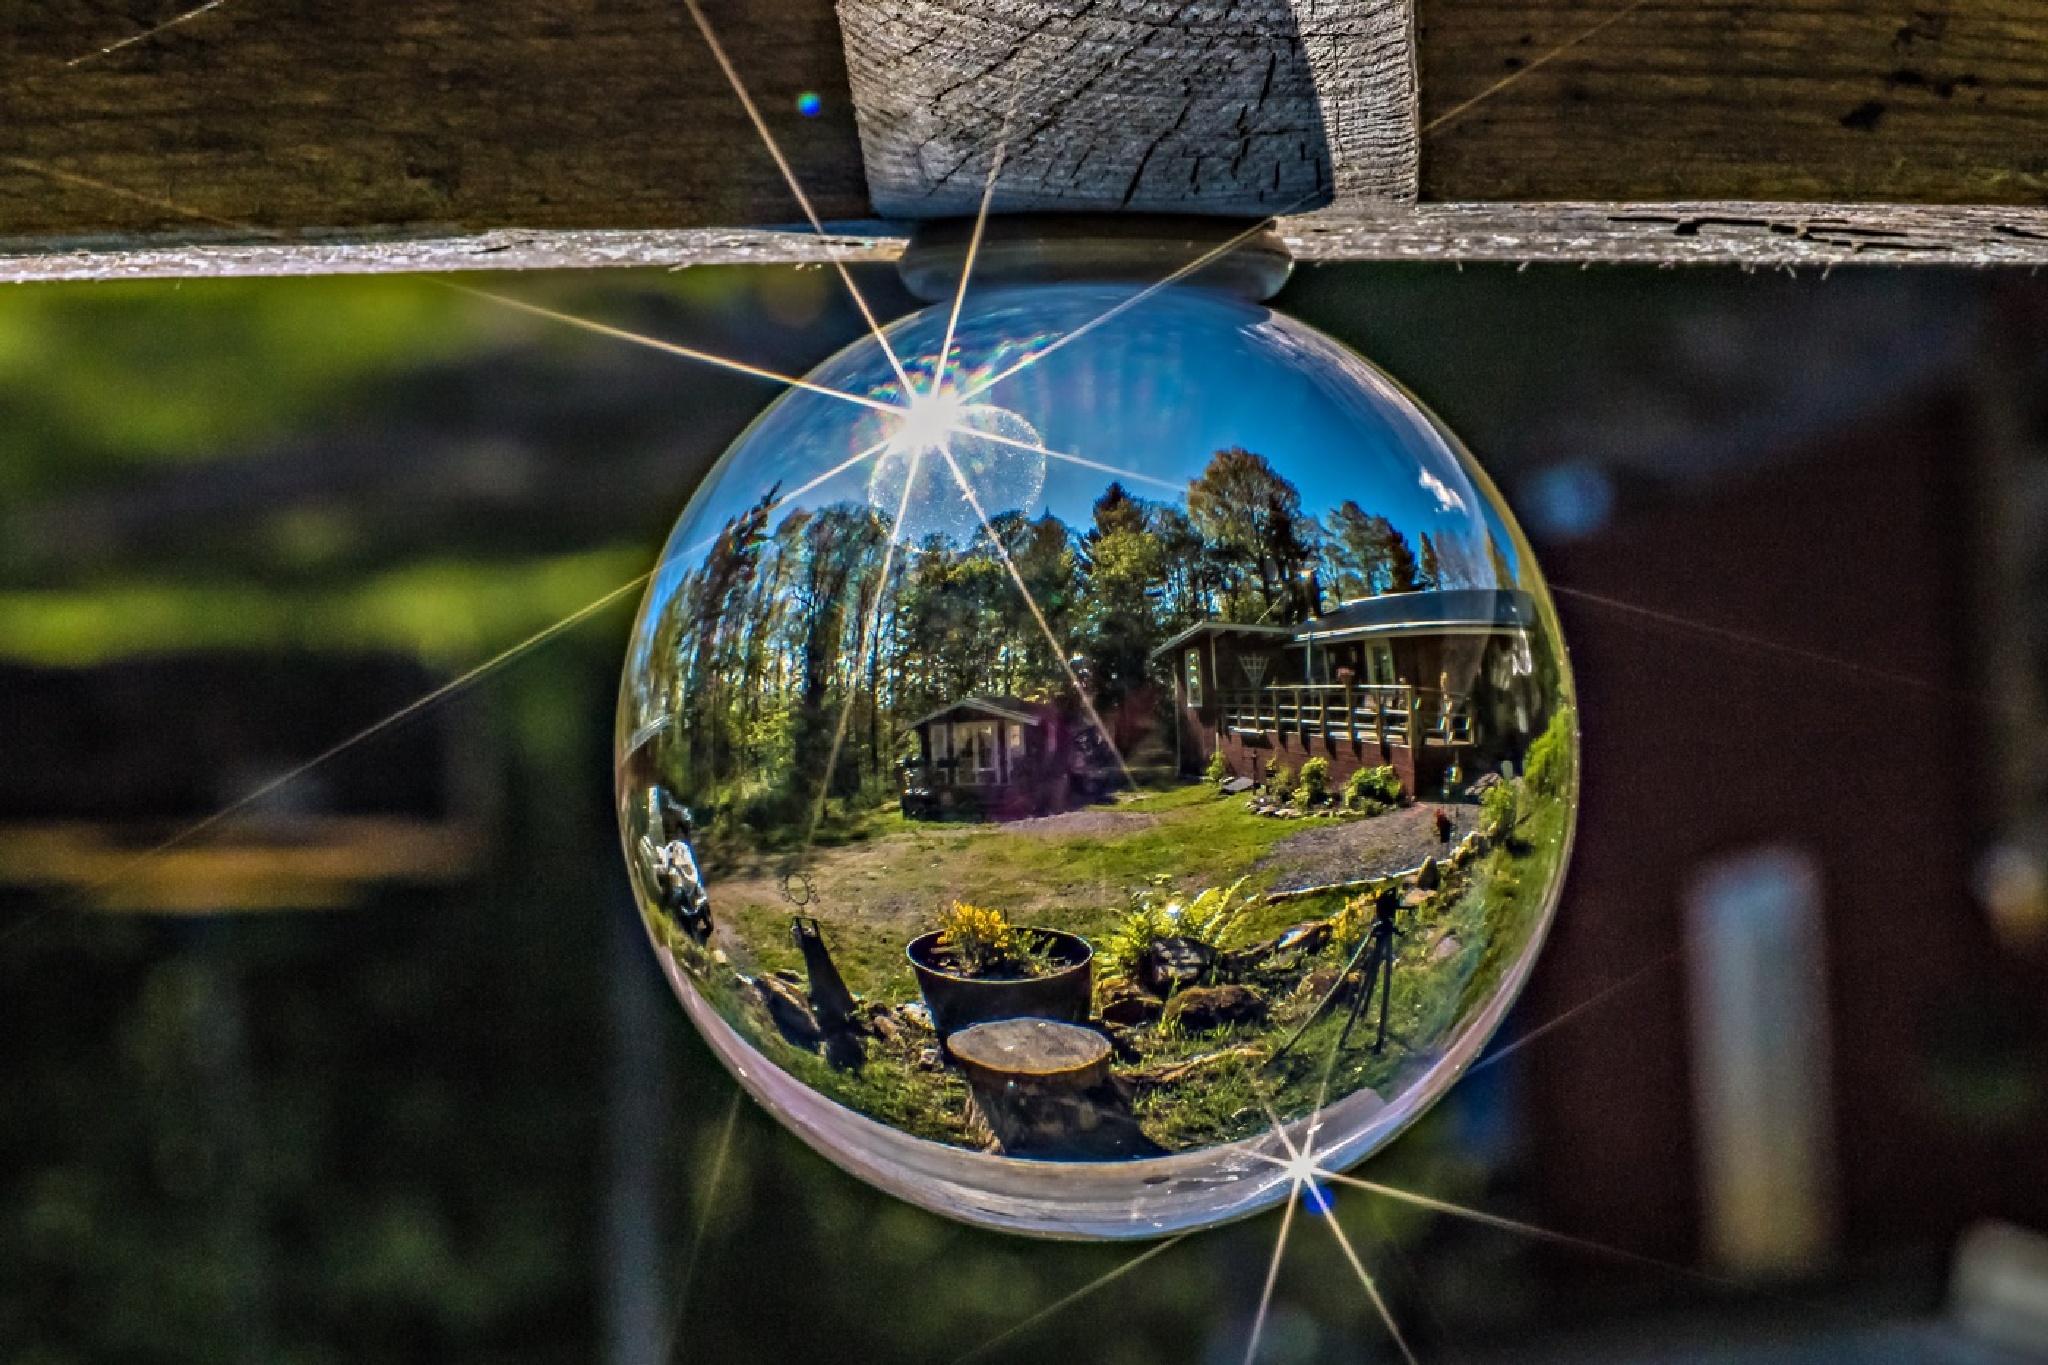 Kristal ball by Mrgit Kluthke